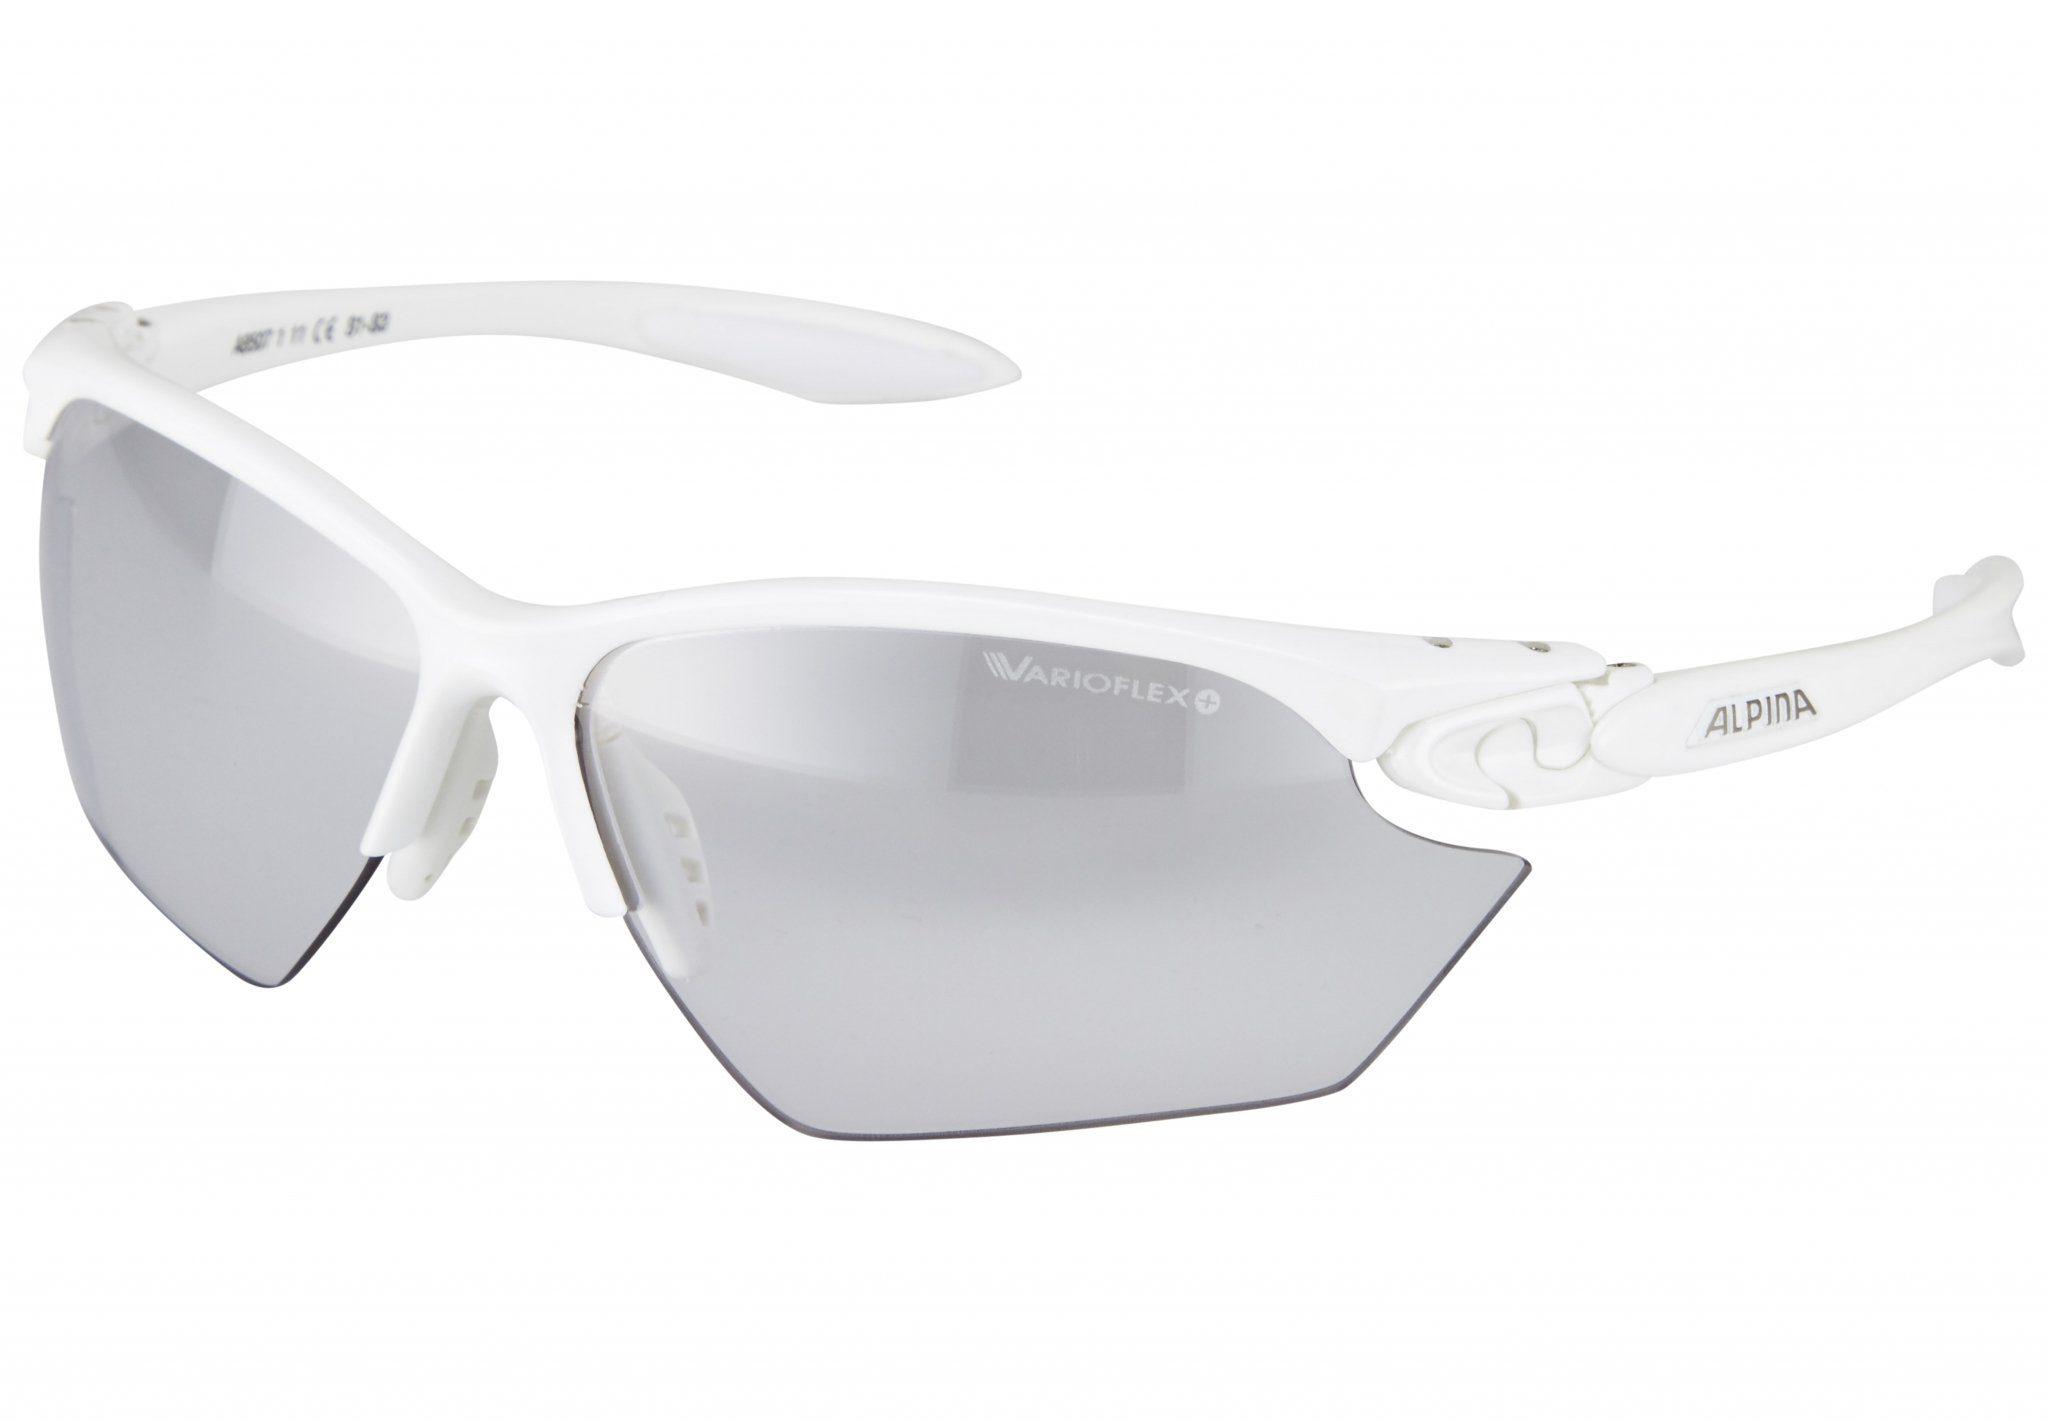 Alpina Radsportbrille »Twist Four S VL+«